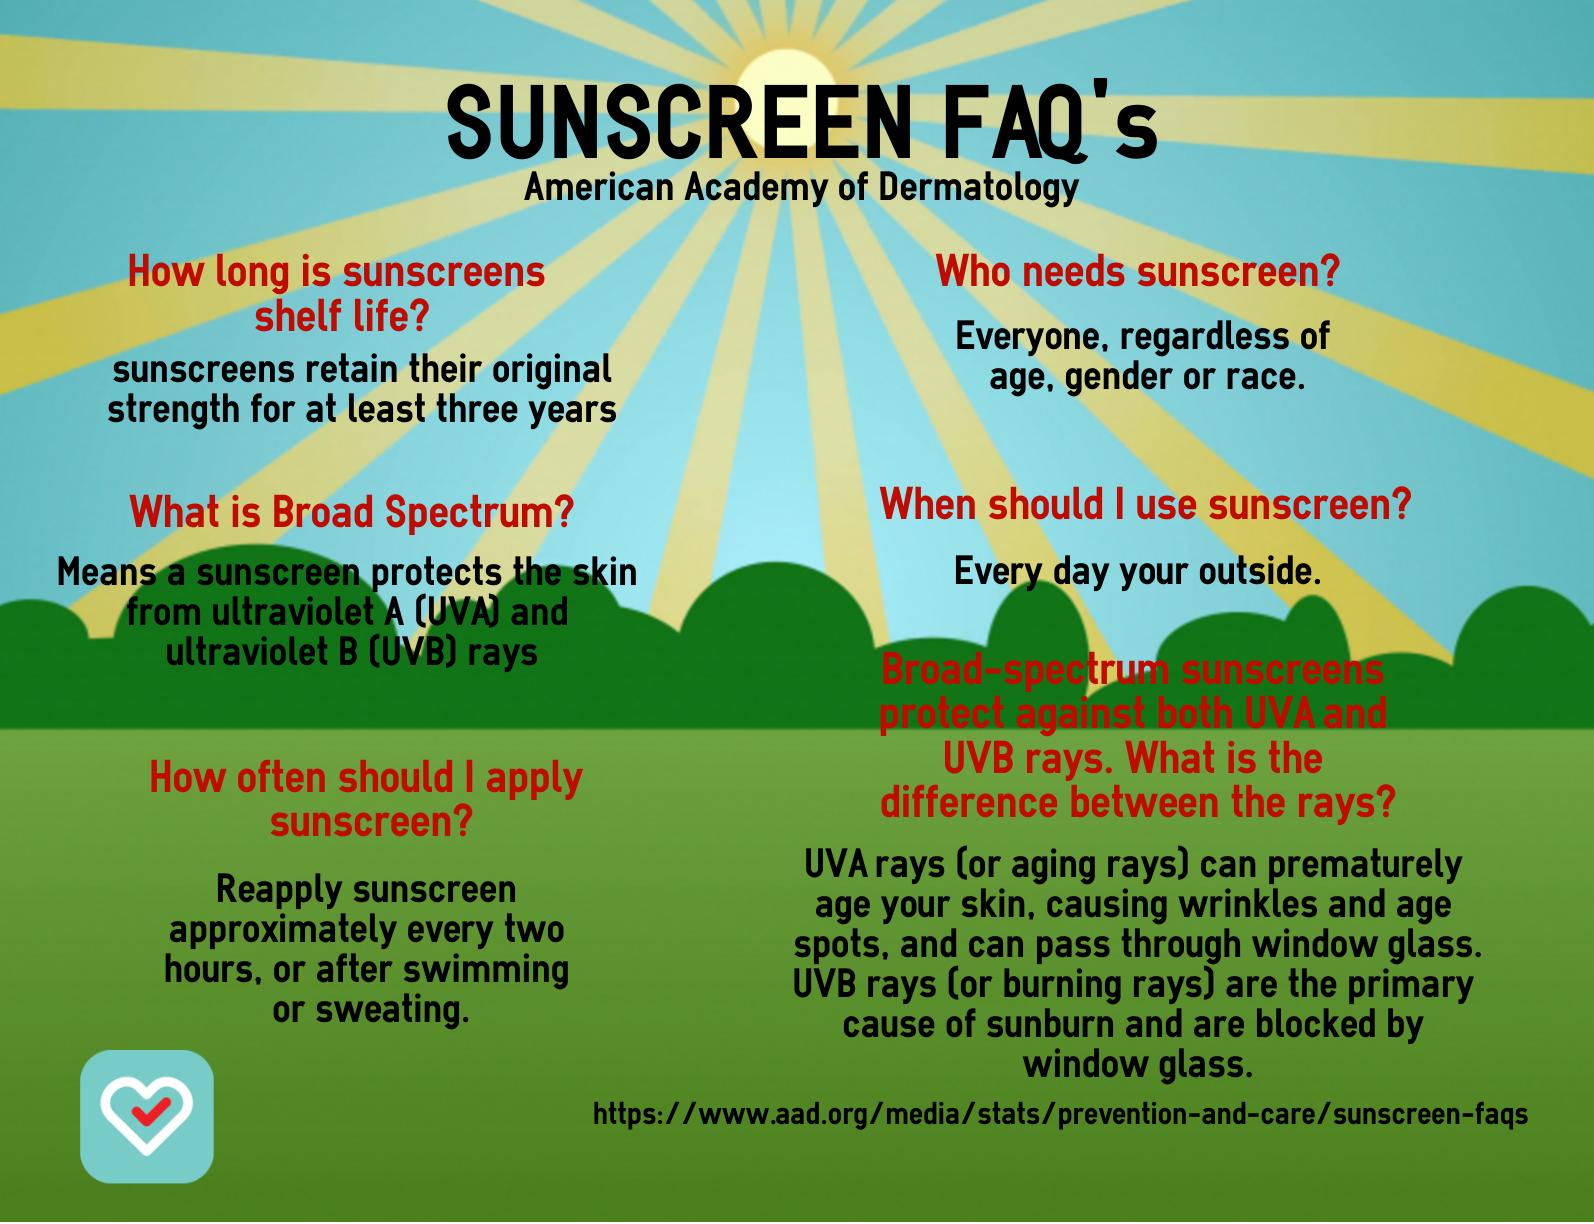 sunscreen FAQs-3.png